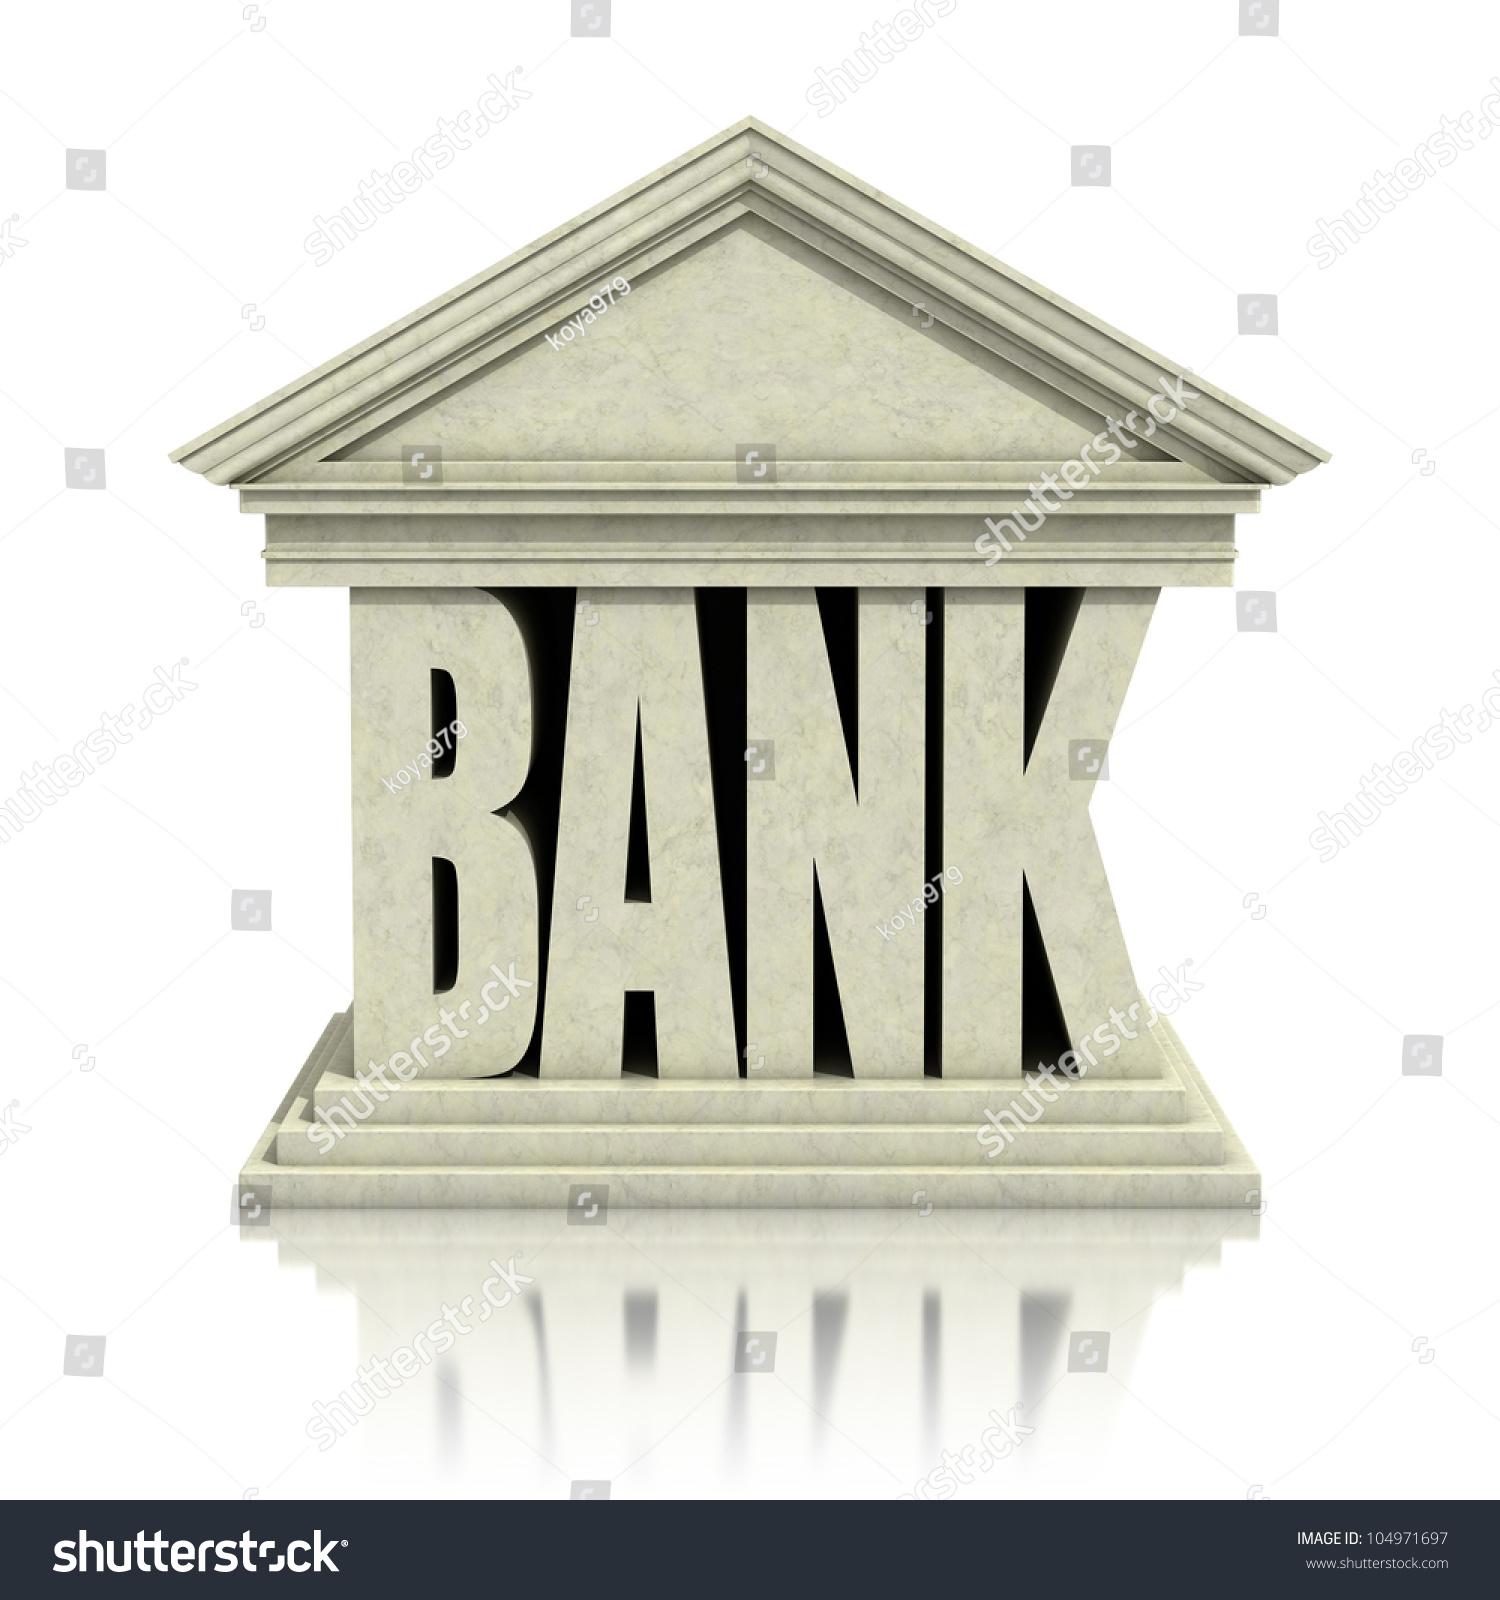 bank customer clipart - photo #40